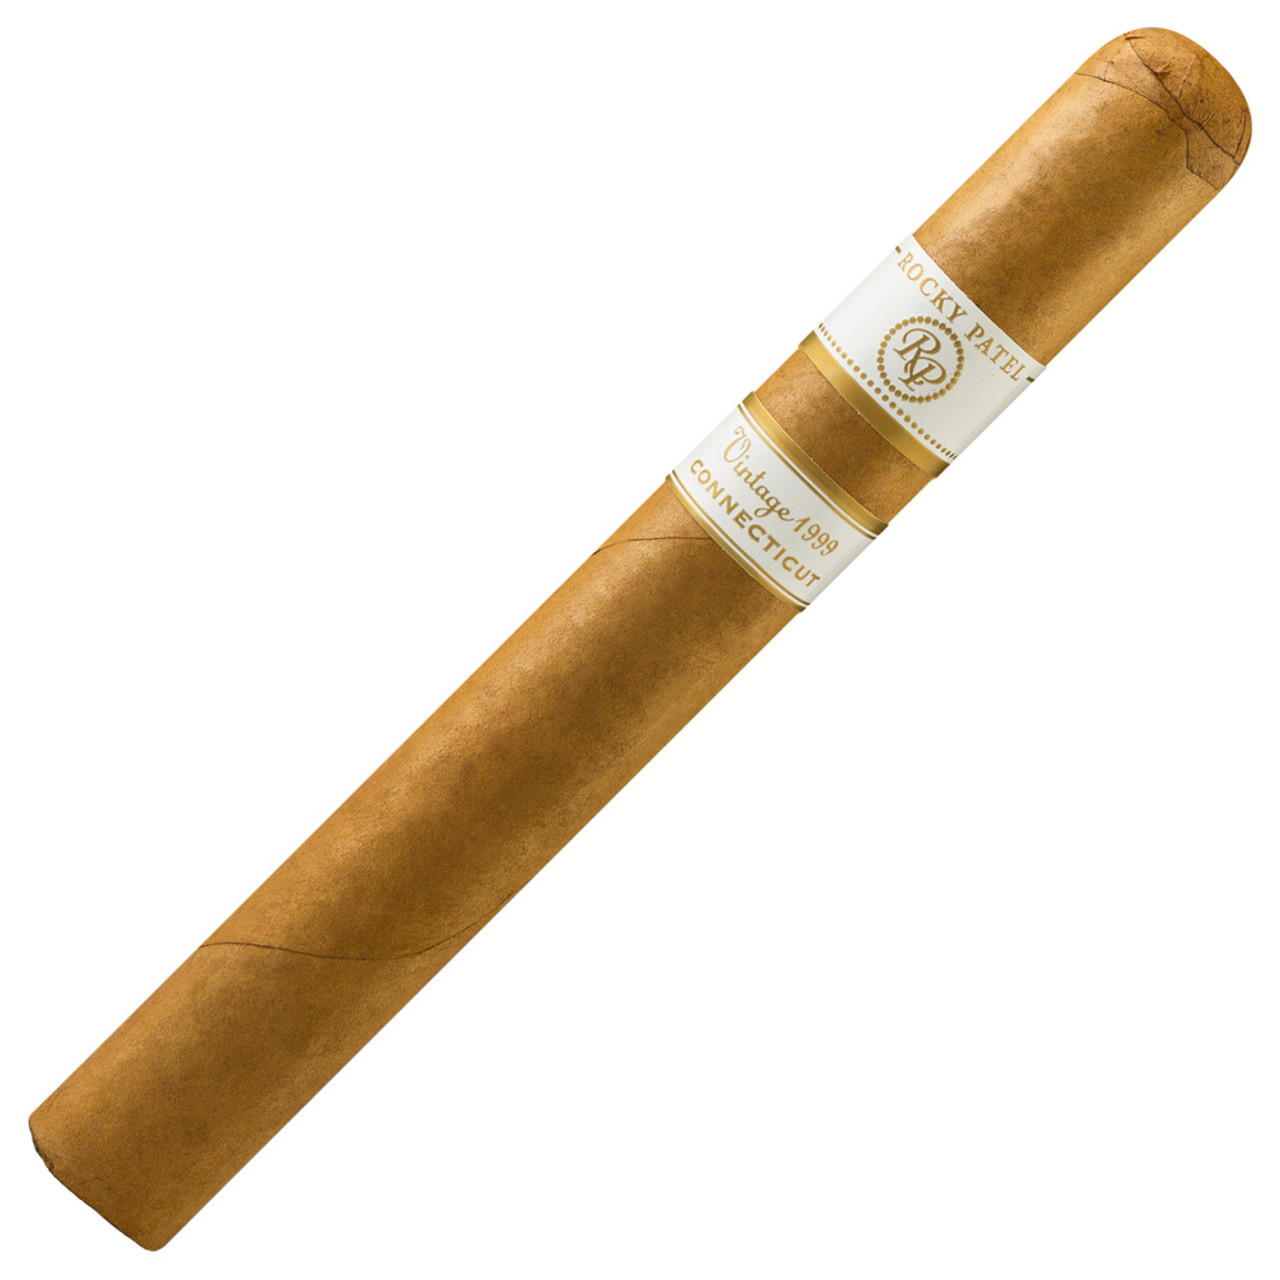 Rocky Patel Vintage 1999 Toro Tubo Cigars - 6 x 50 (Box of 10)